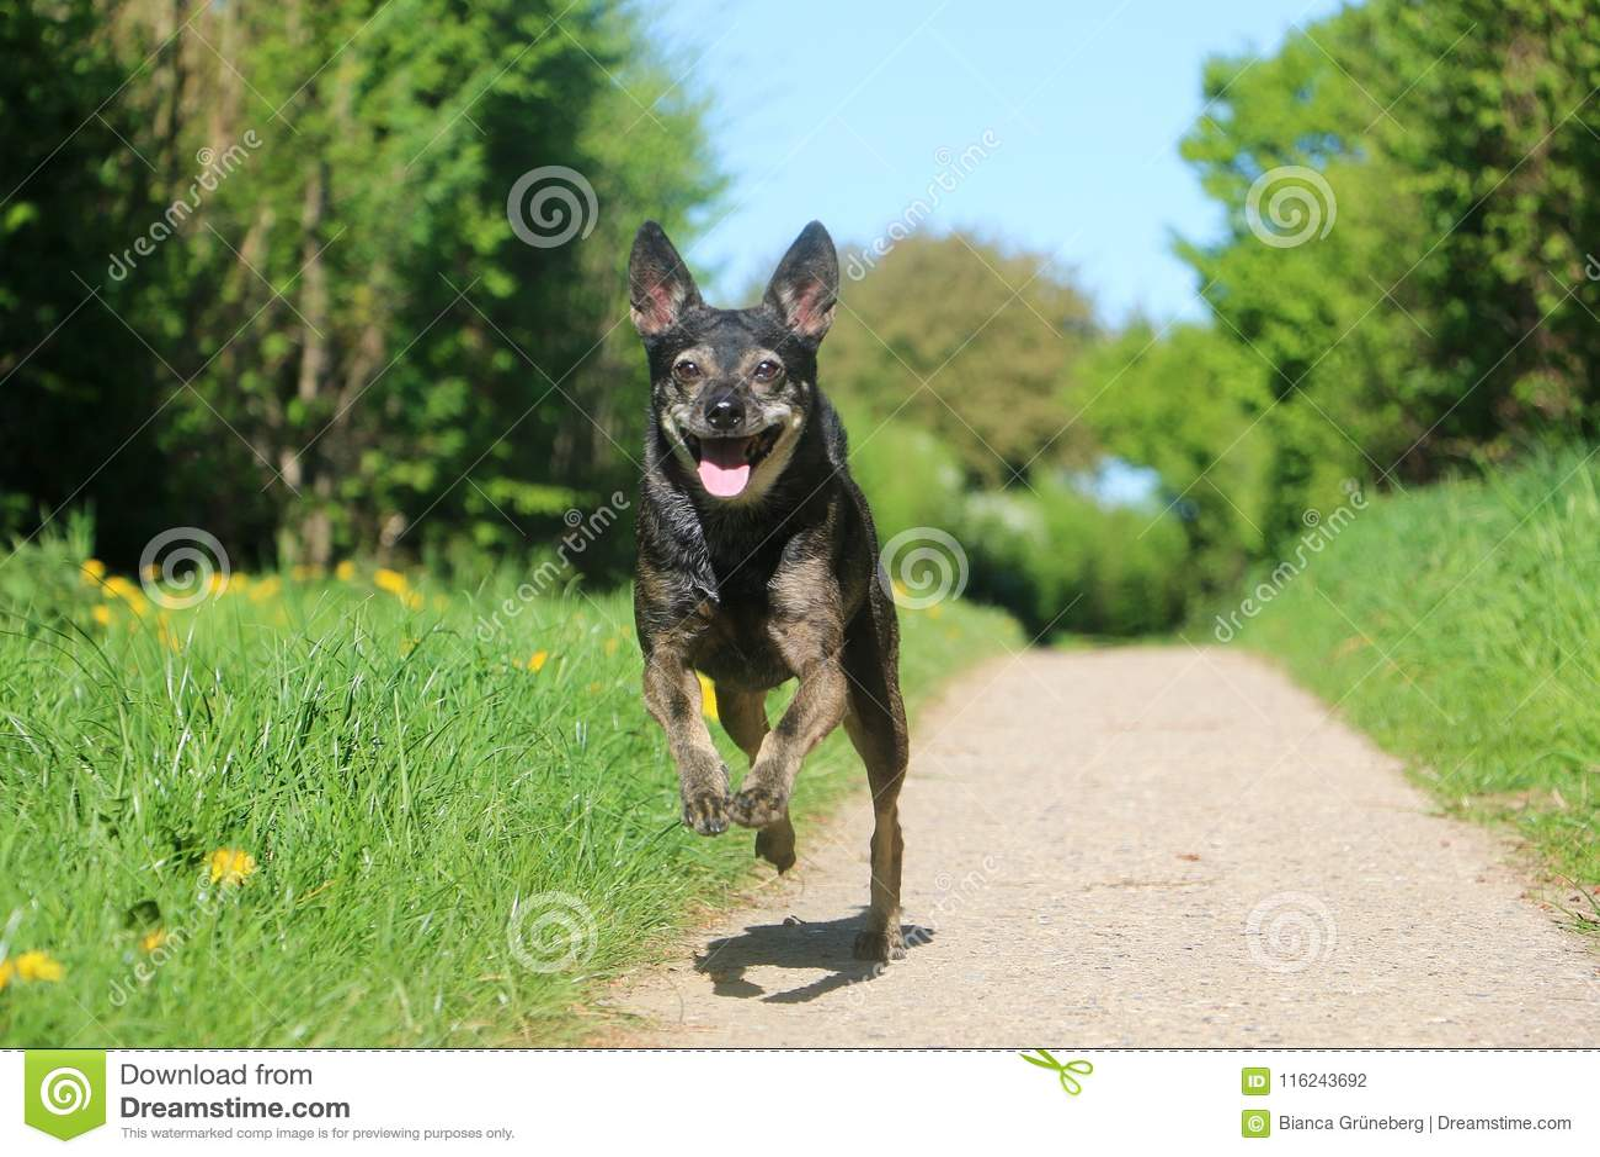 Small running dog on the street